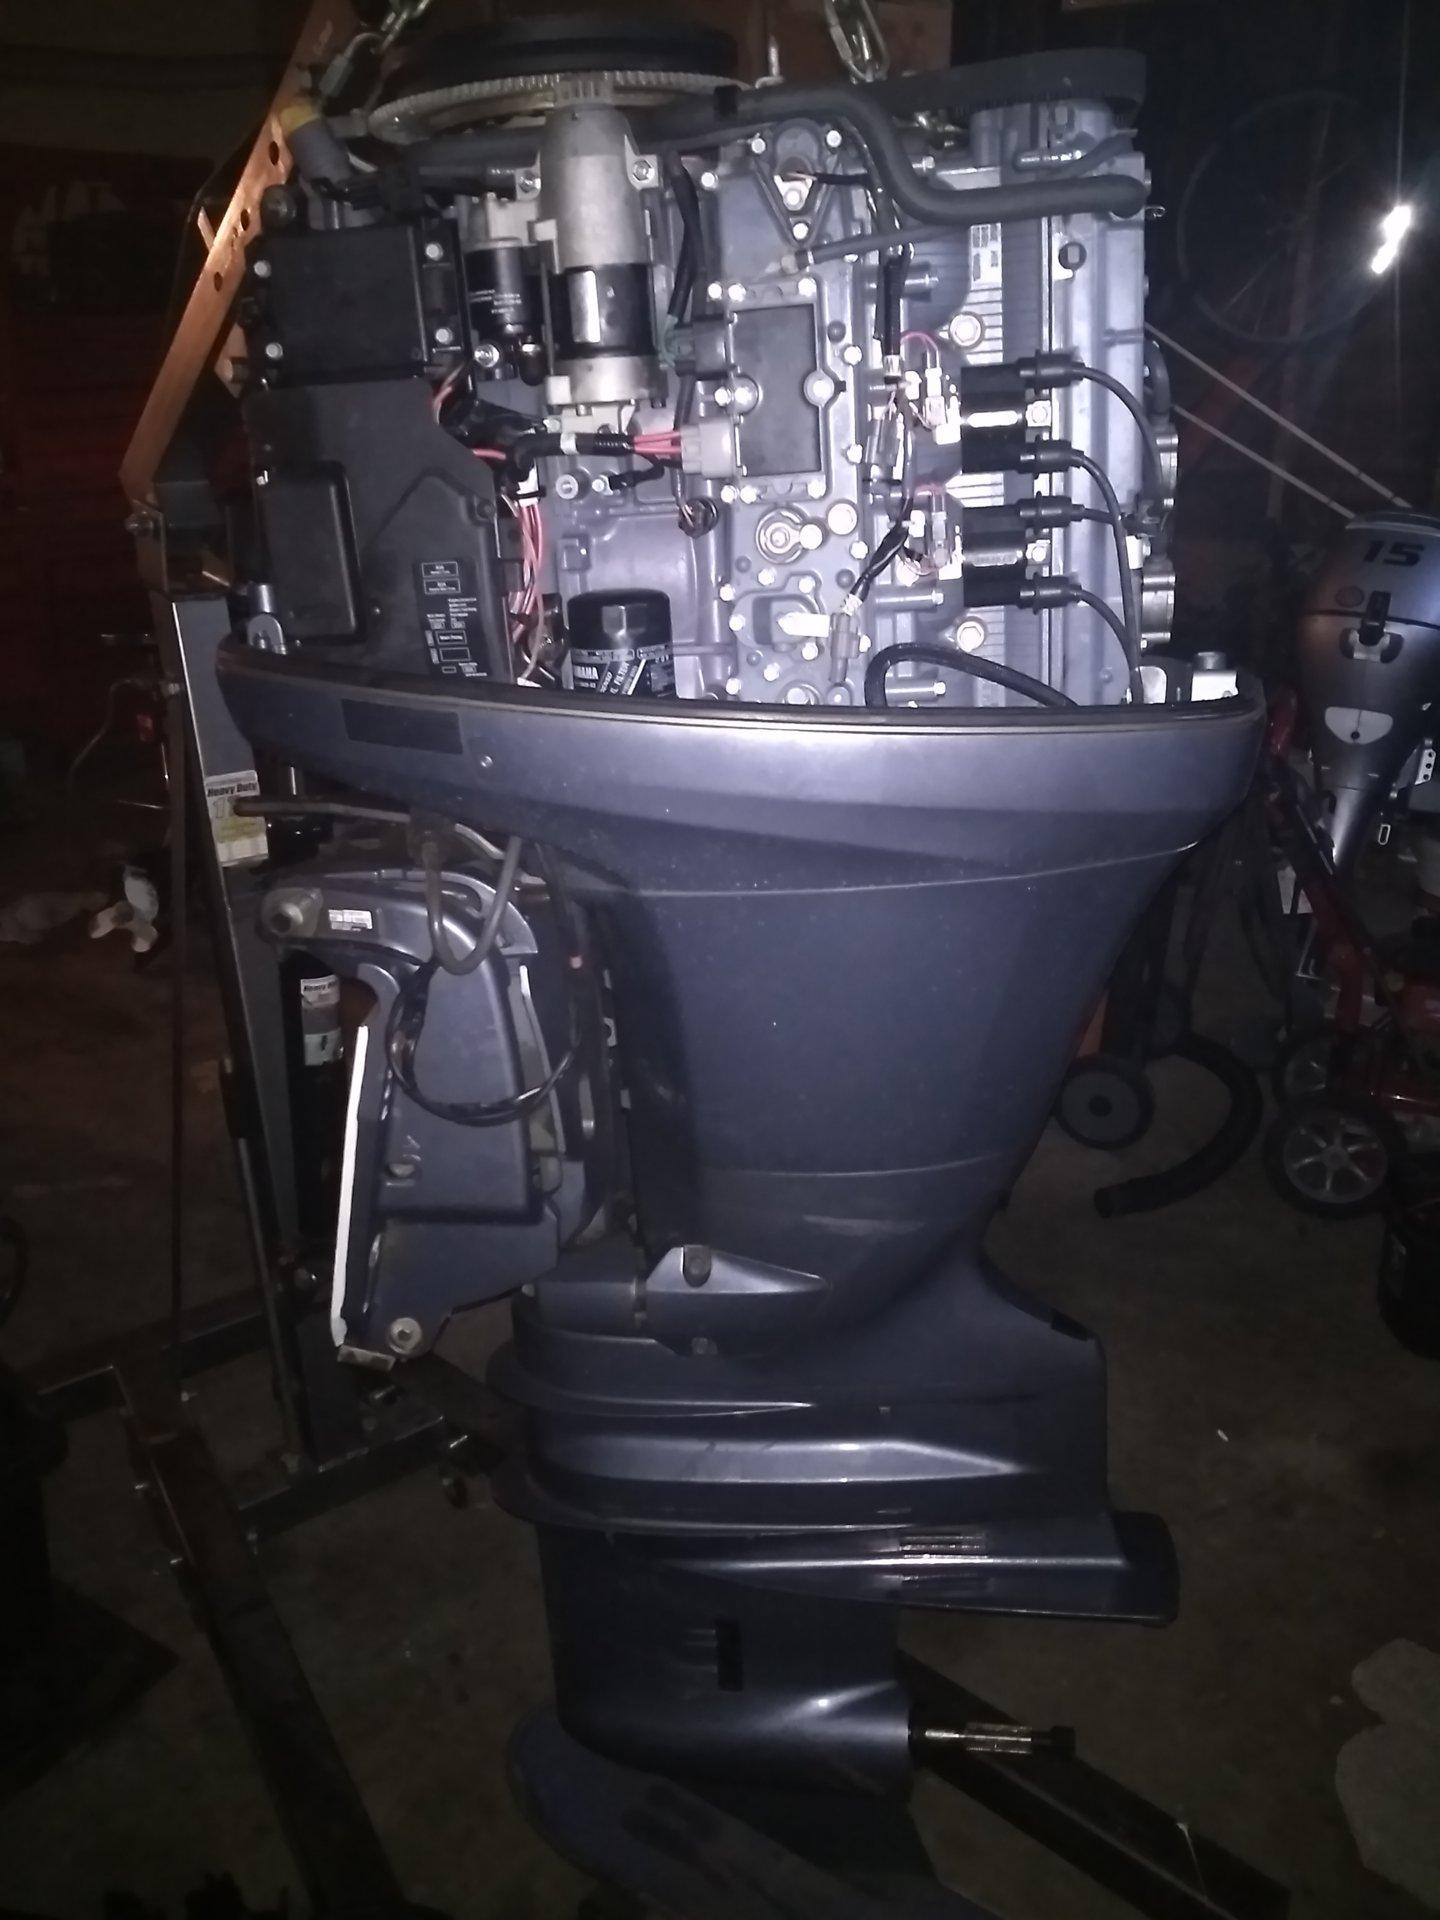 F D C B Cc A Df C A Dc on Fuel Pump Filter